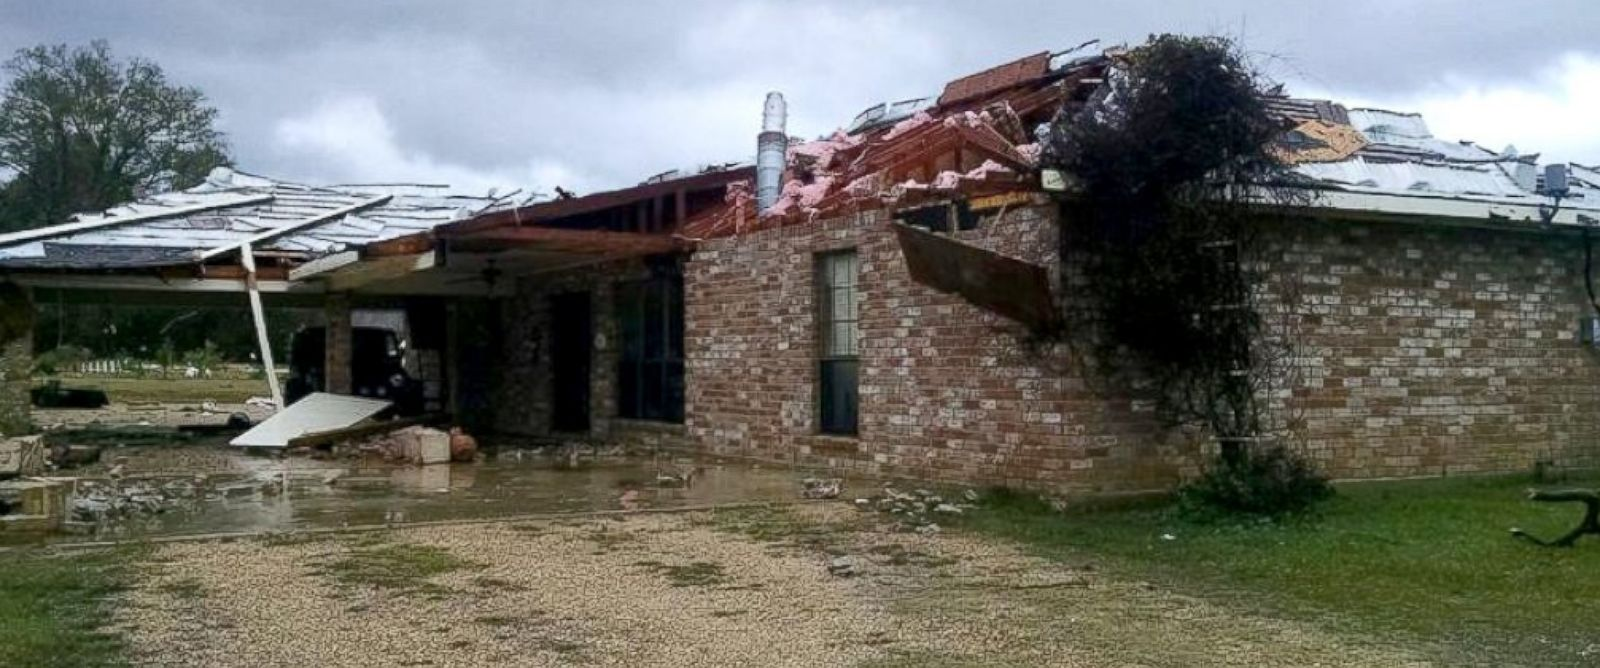 PHOTO: A tornado swept through the Amite, LA damaging property, Dec. 23, 2014.